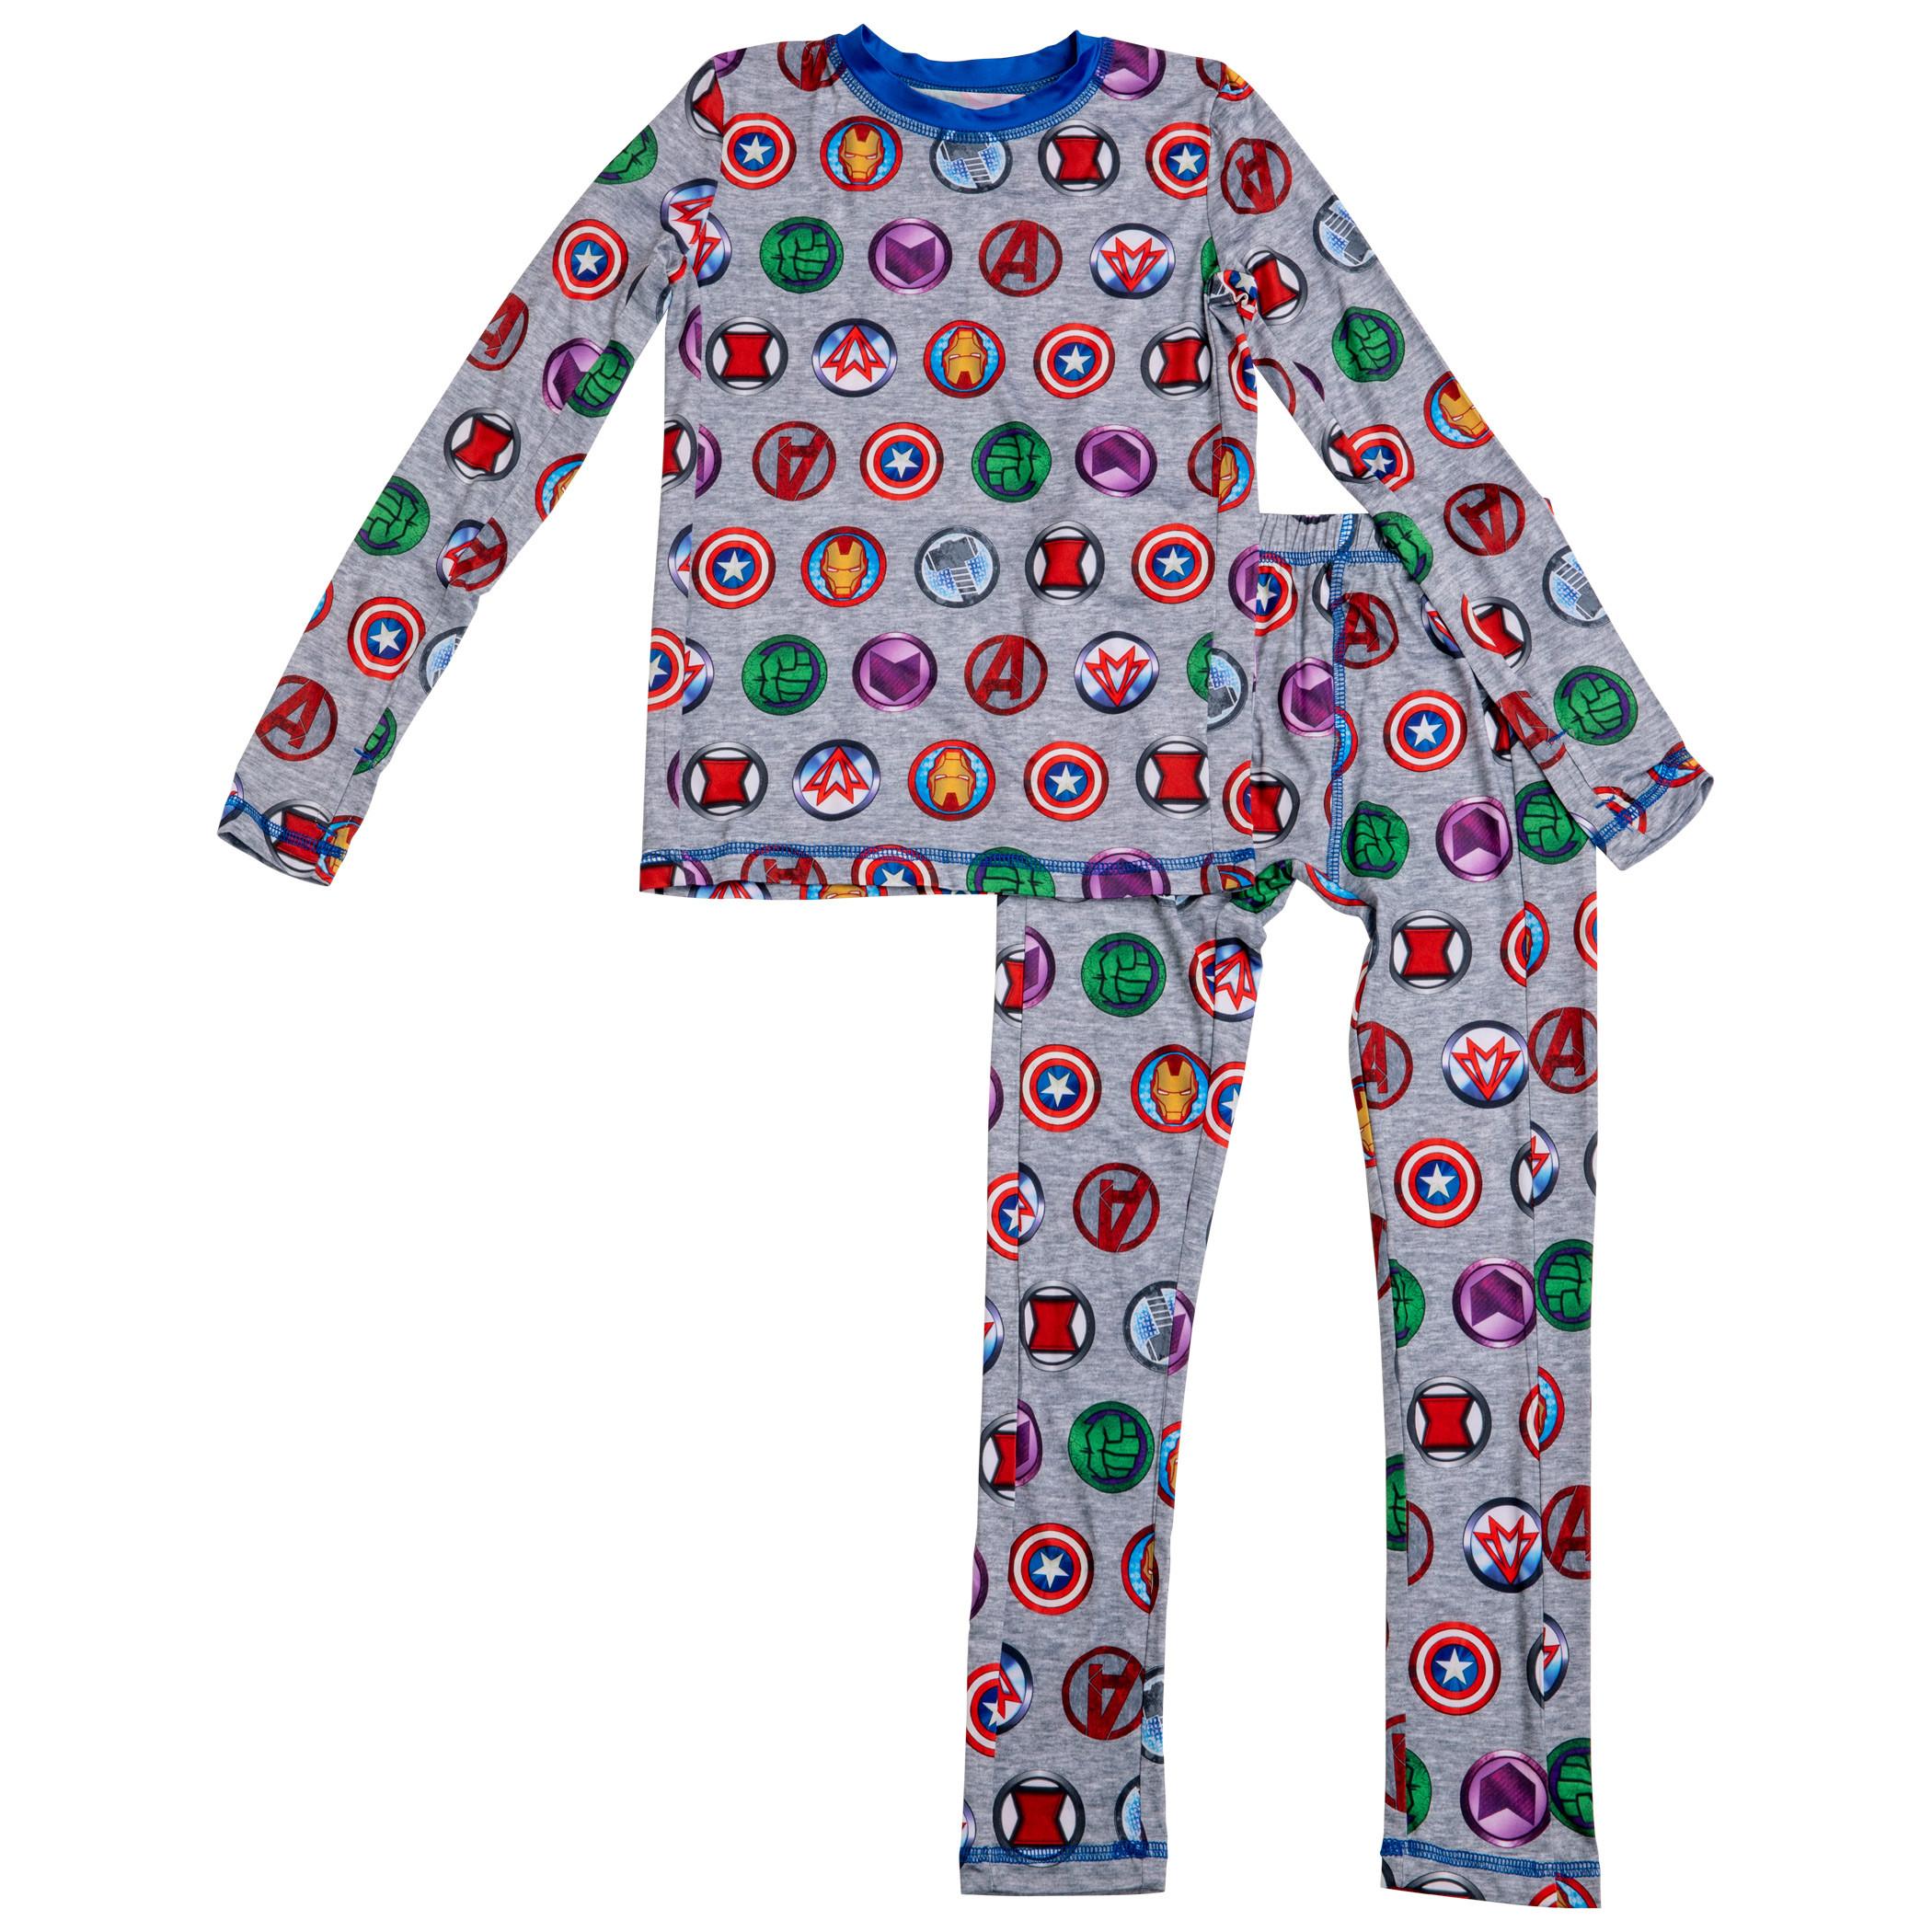 Marvel Avengers Hero Logos All Over Print Big Boys 2-Piece Pajama Set